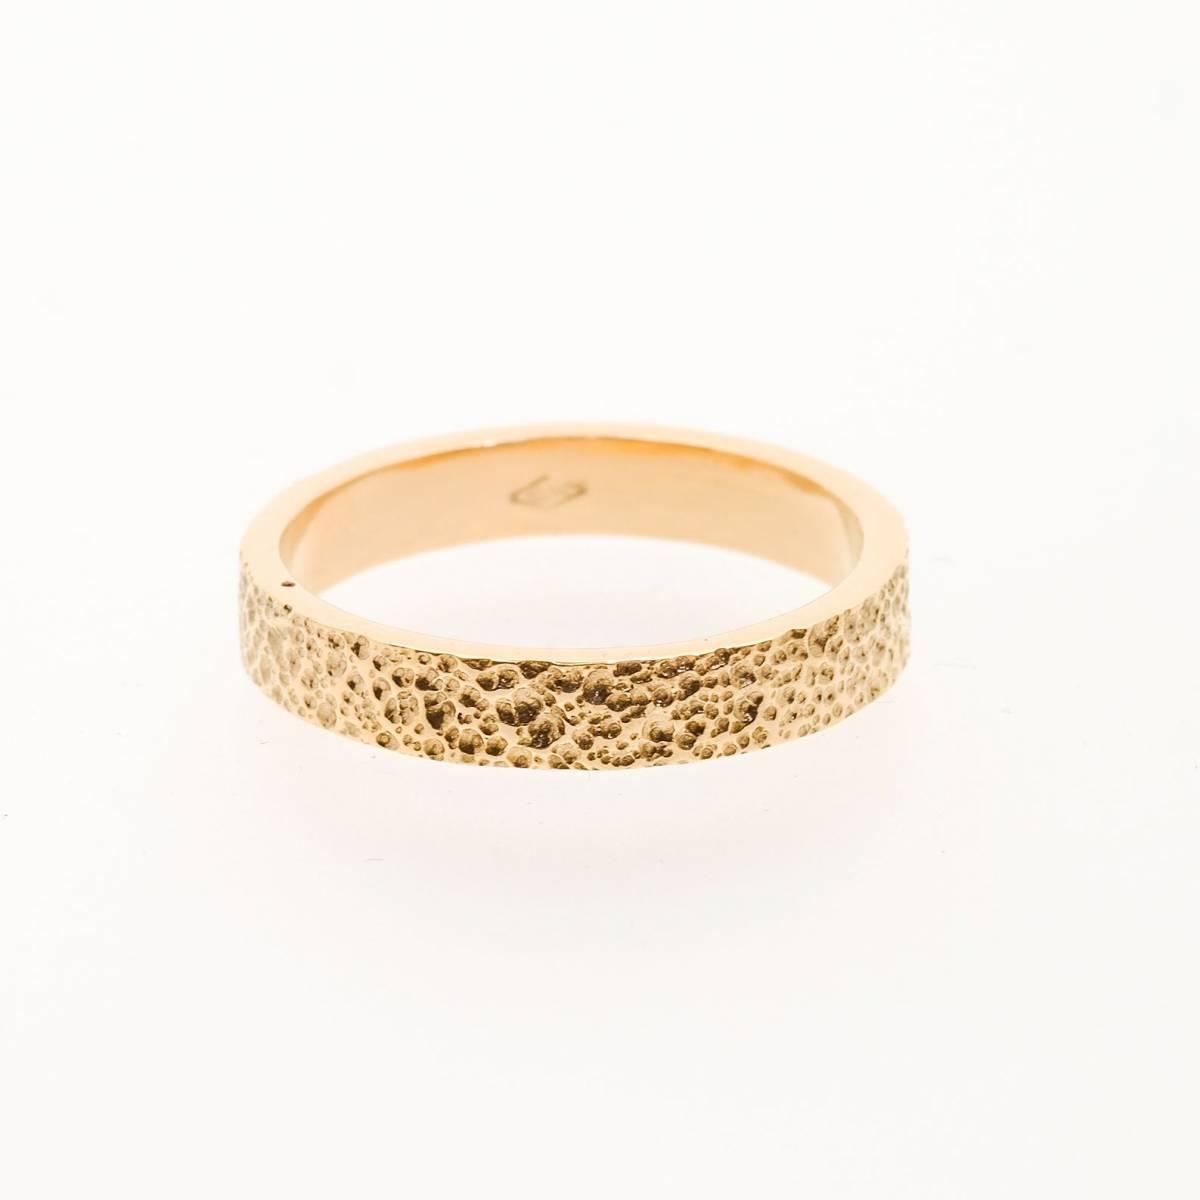 Jonas Maes Jewels - Juwelen - Bruidsjuwelen - Verlovingsring - Trouwring - House of Weddings - 9